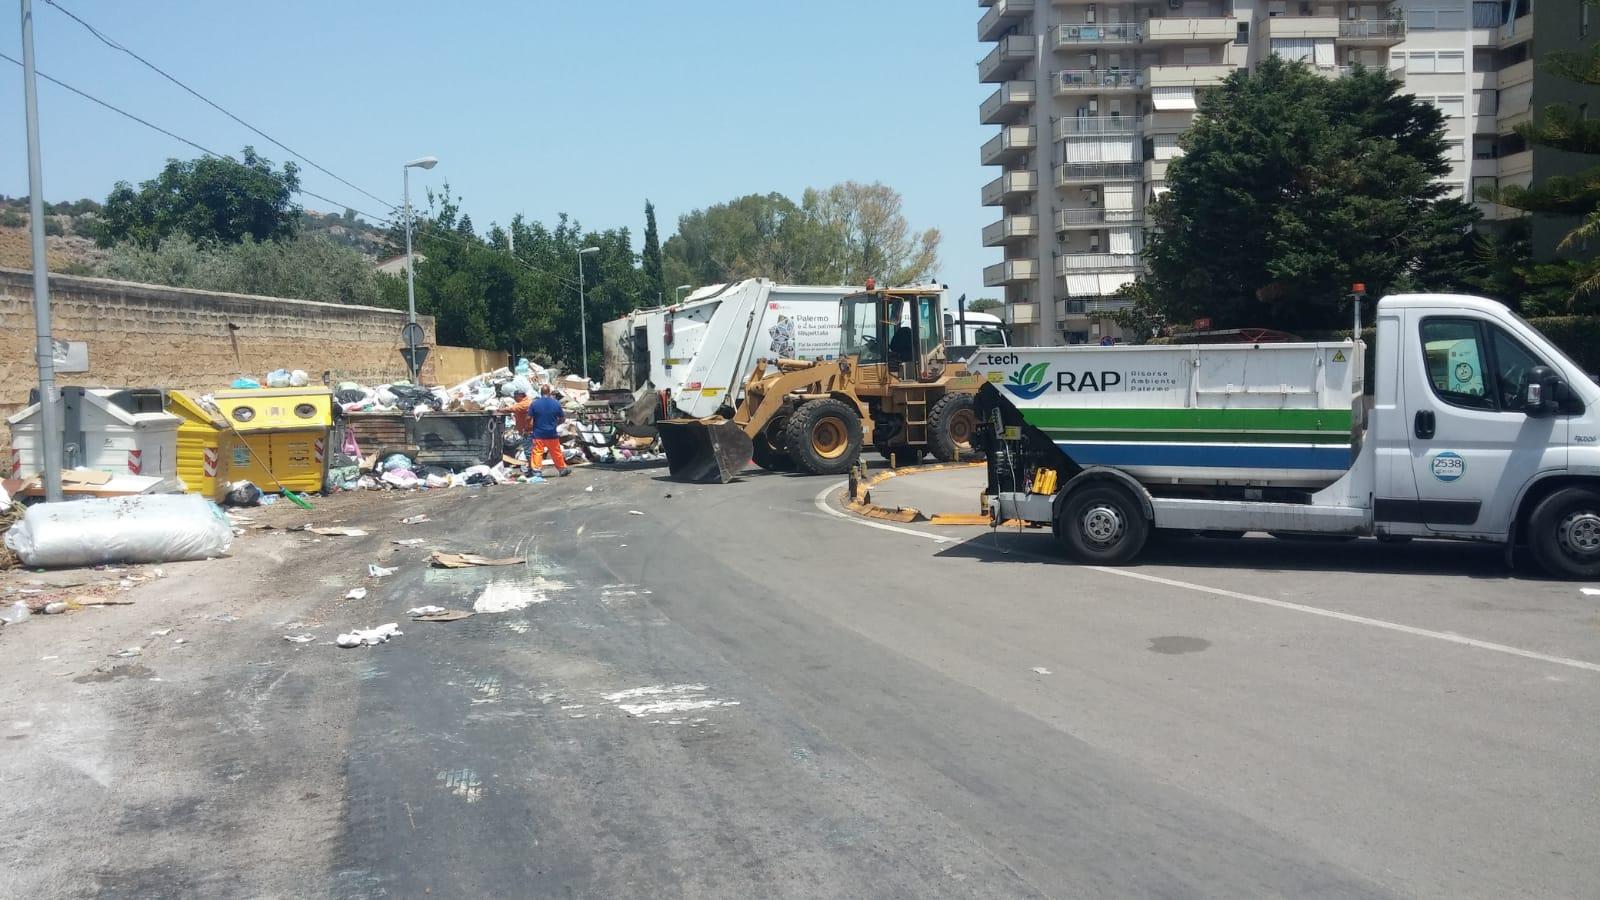 Raccolta rifiuti Palermo